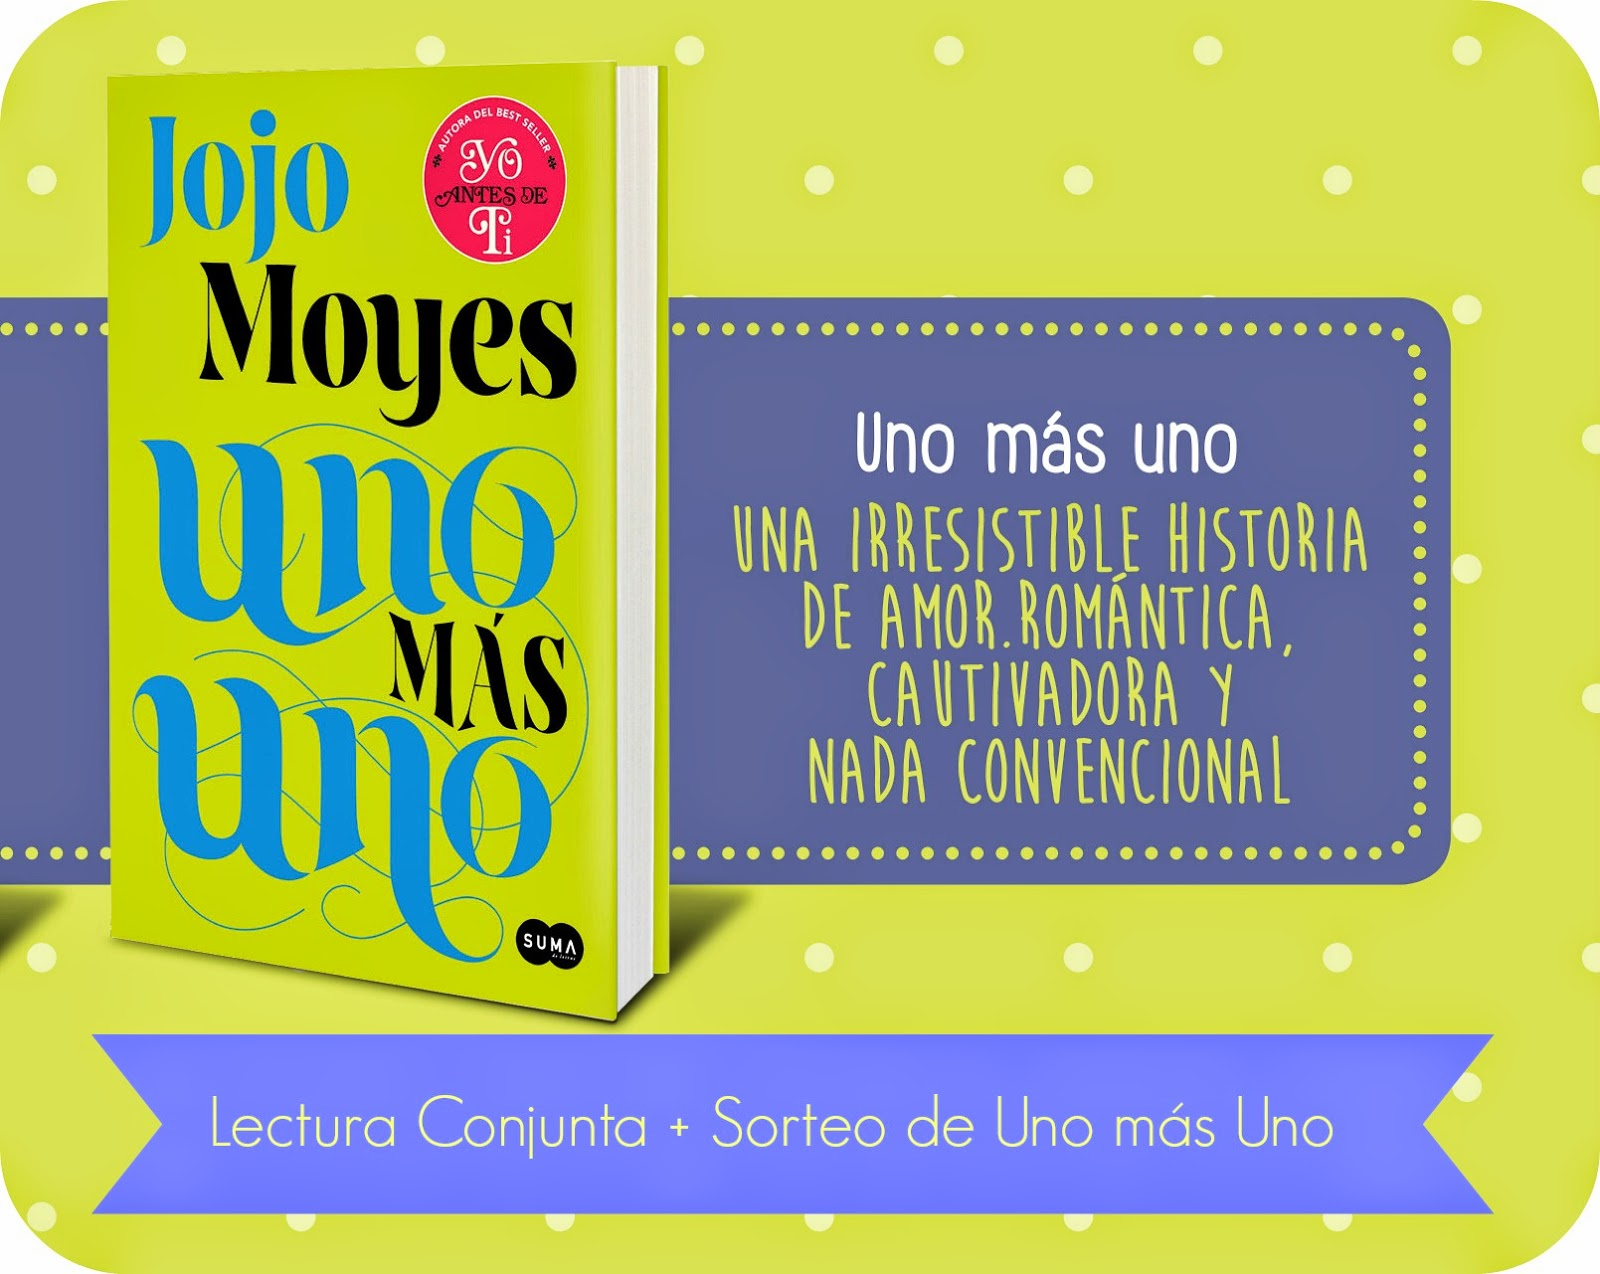 Lectura Conjunta + Sorteo